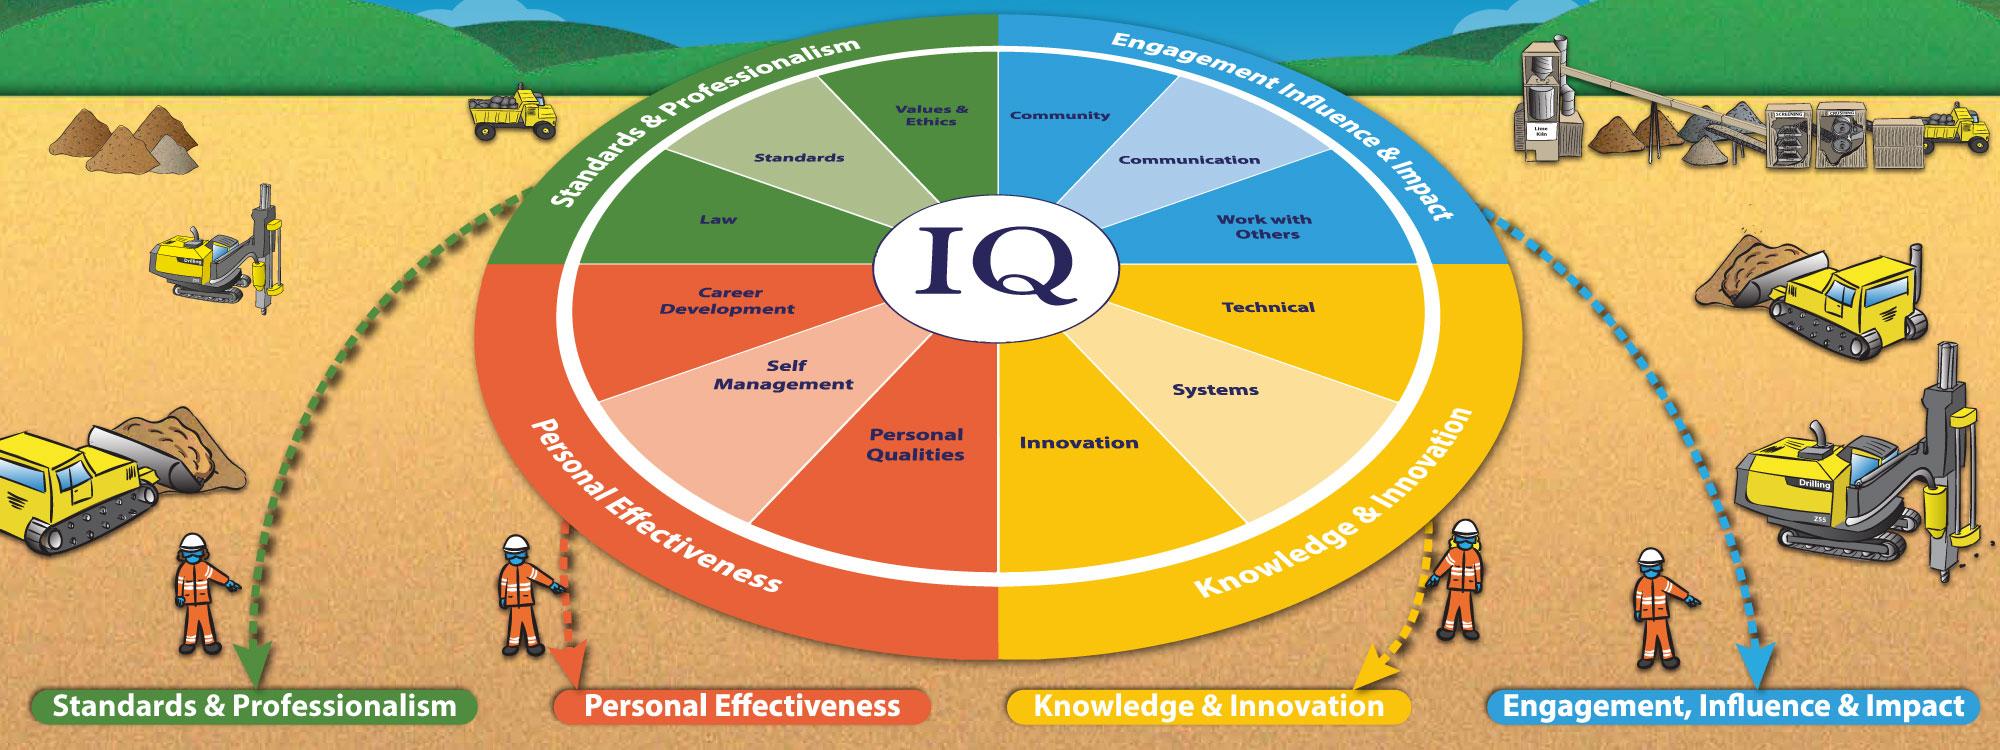 How IQ supports career development